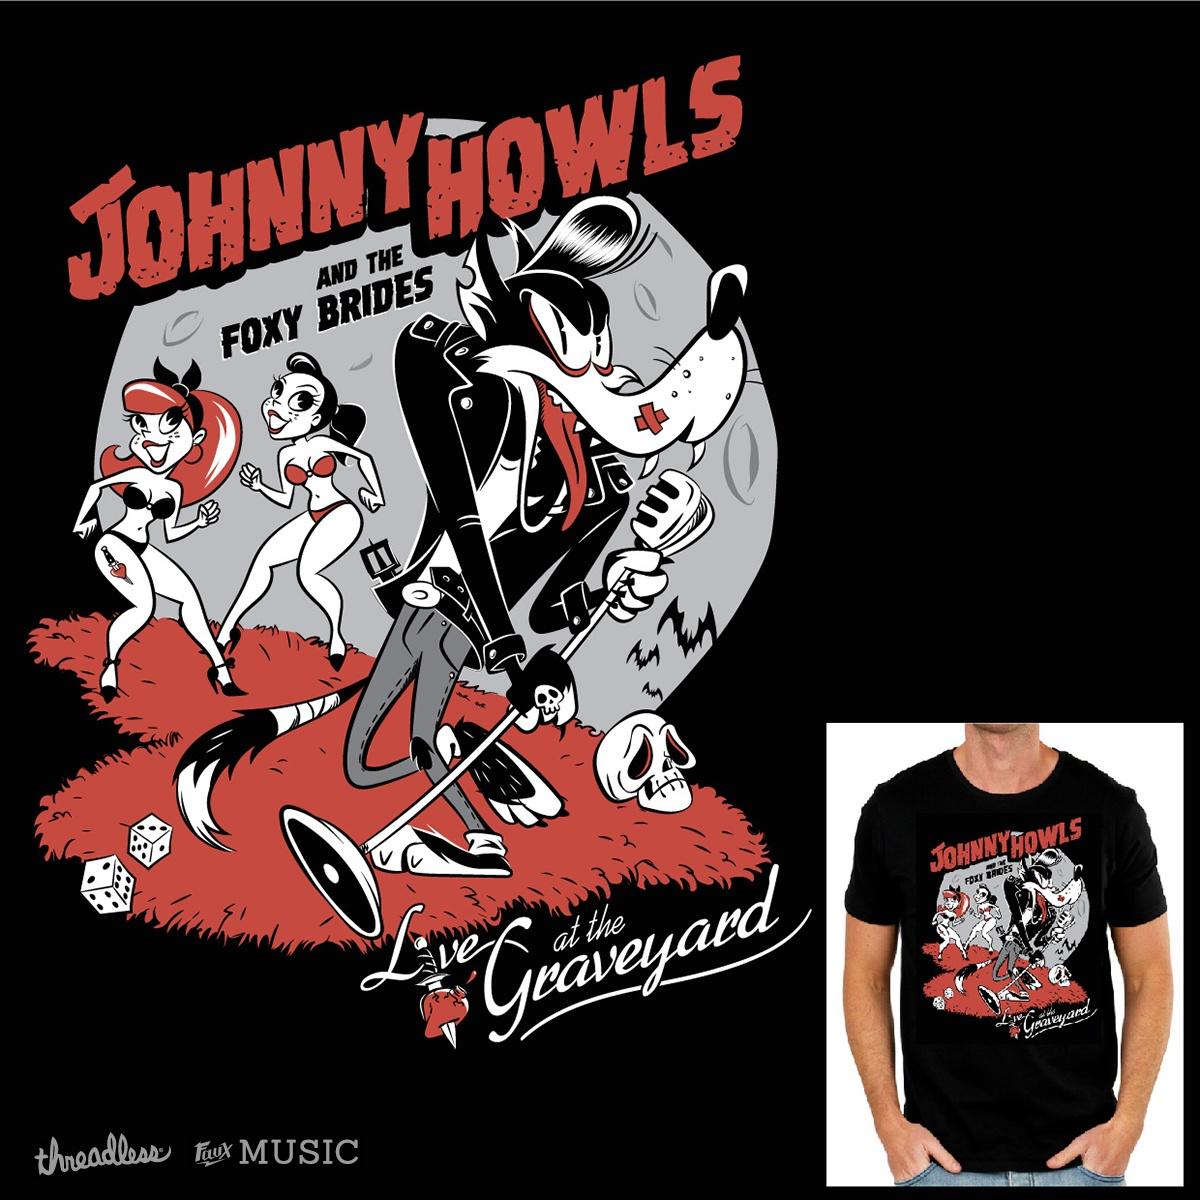 Johnny Howls and the Foxy Brides by Szoki on Threadless